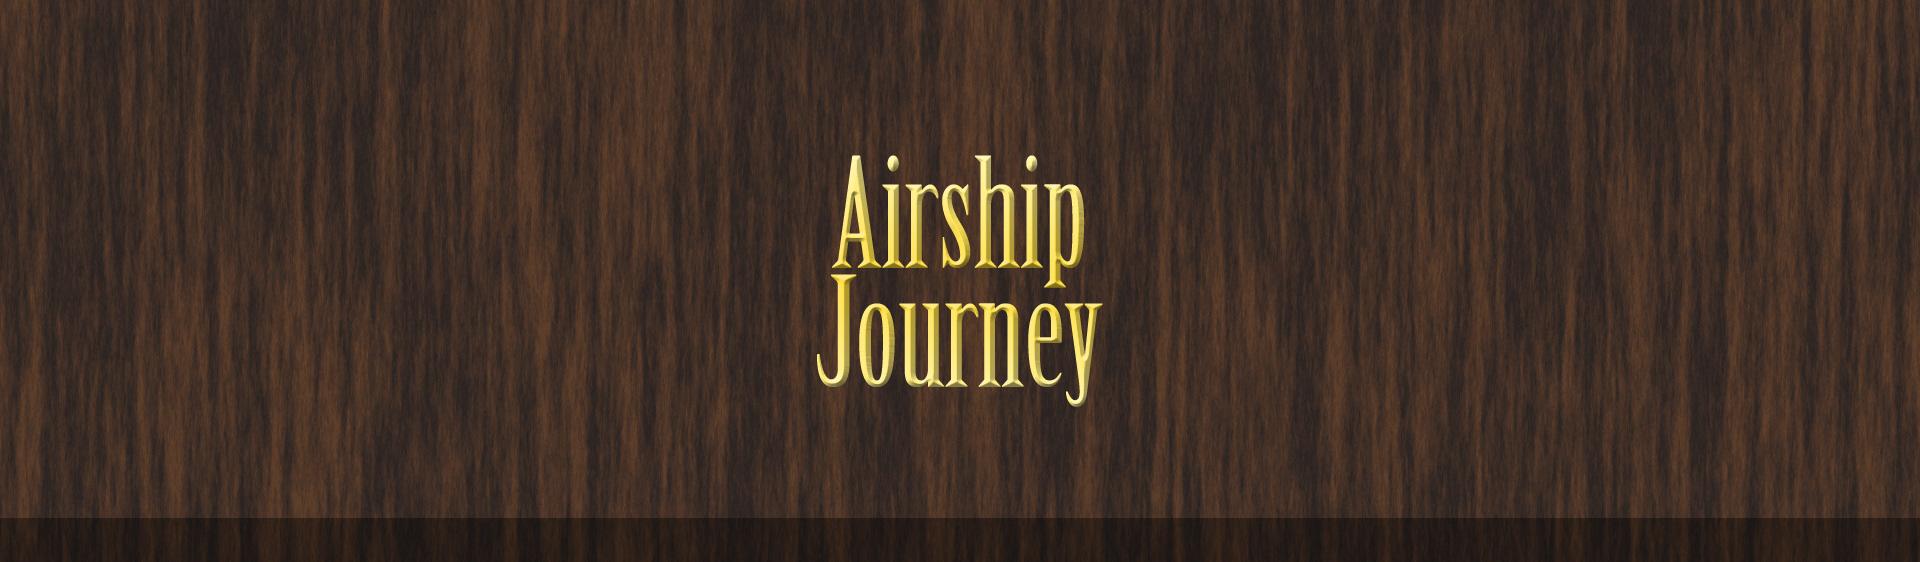 Airship Journey